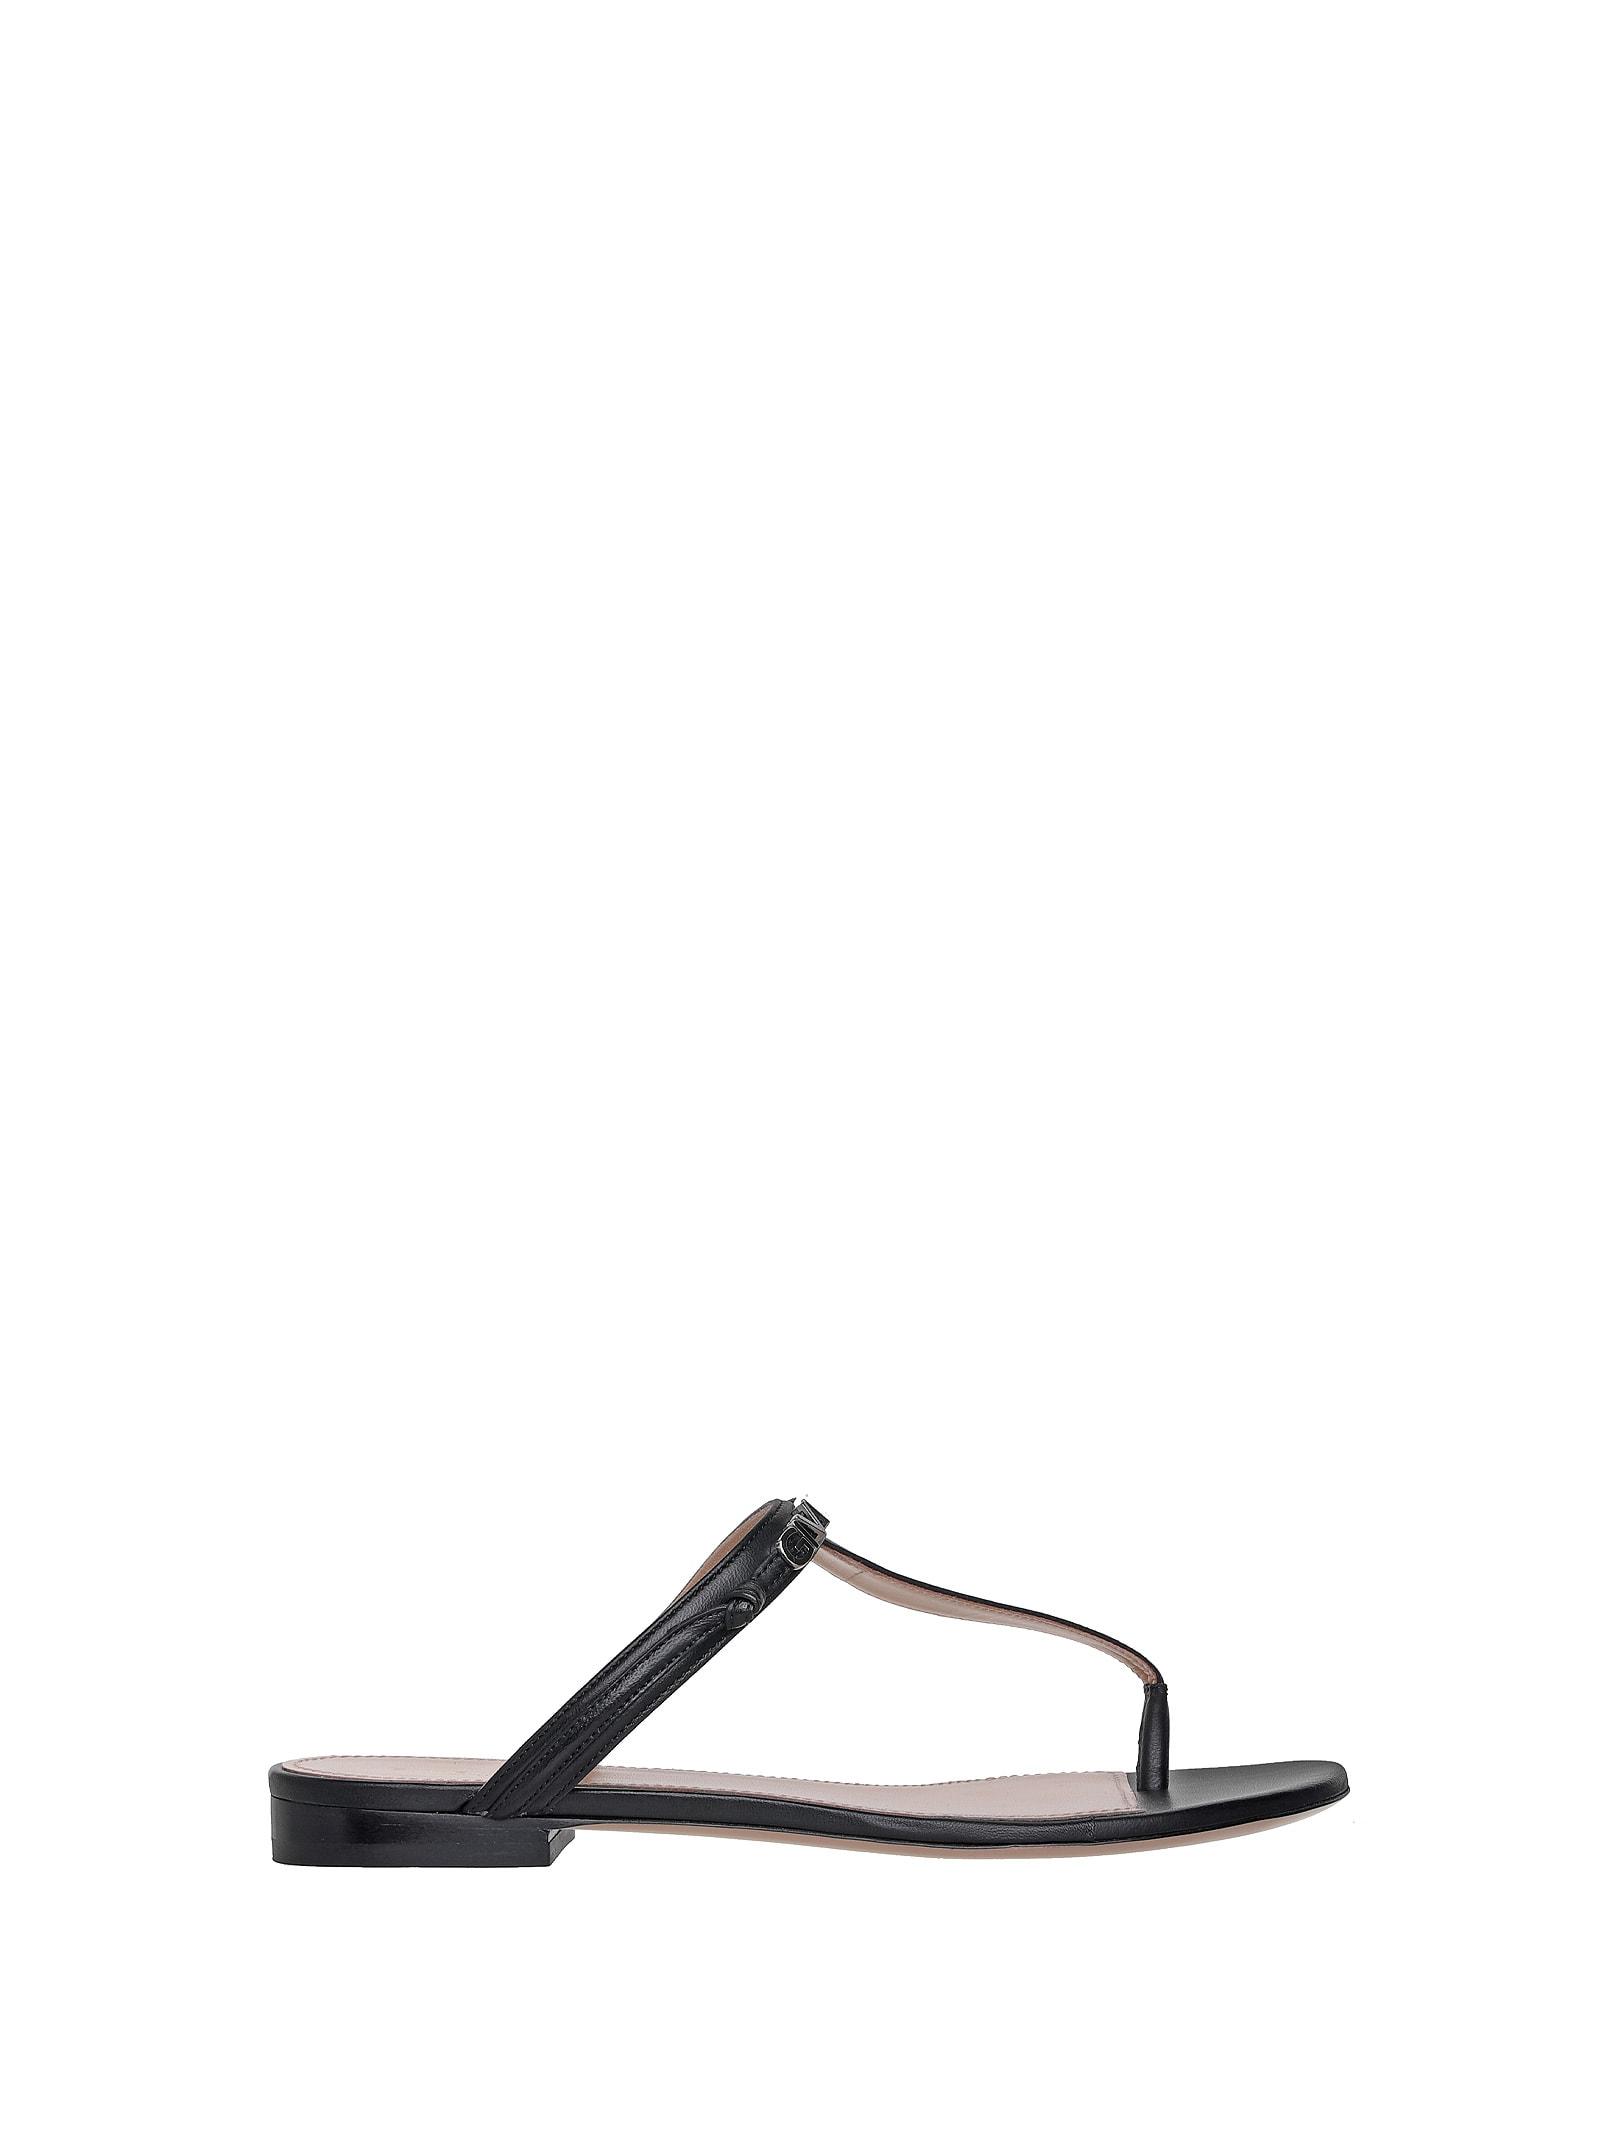 Givenchy Givenchy Logo-strap Sandals